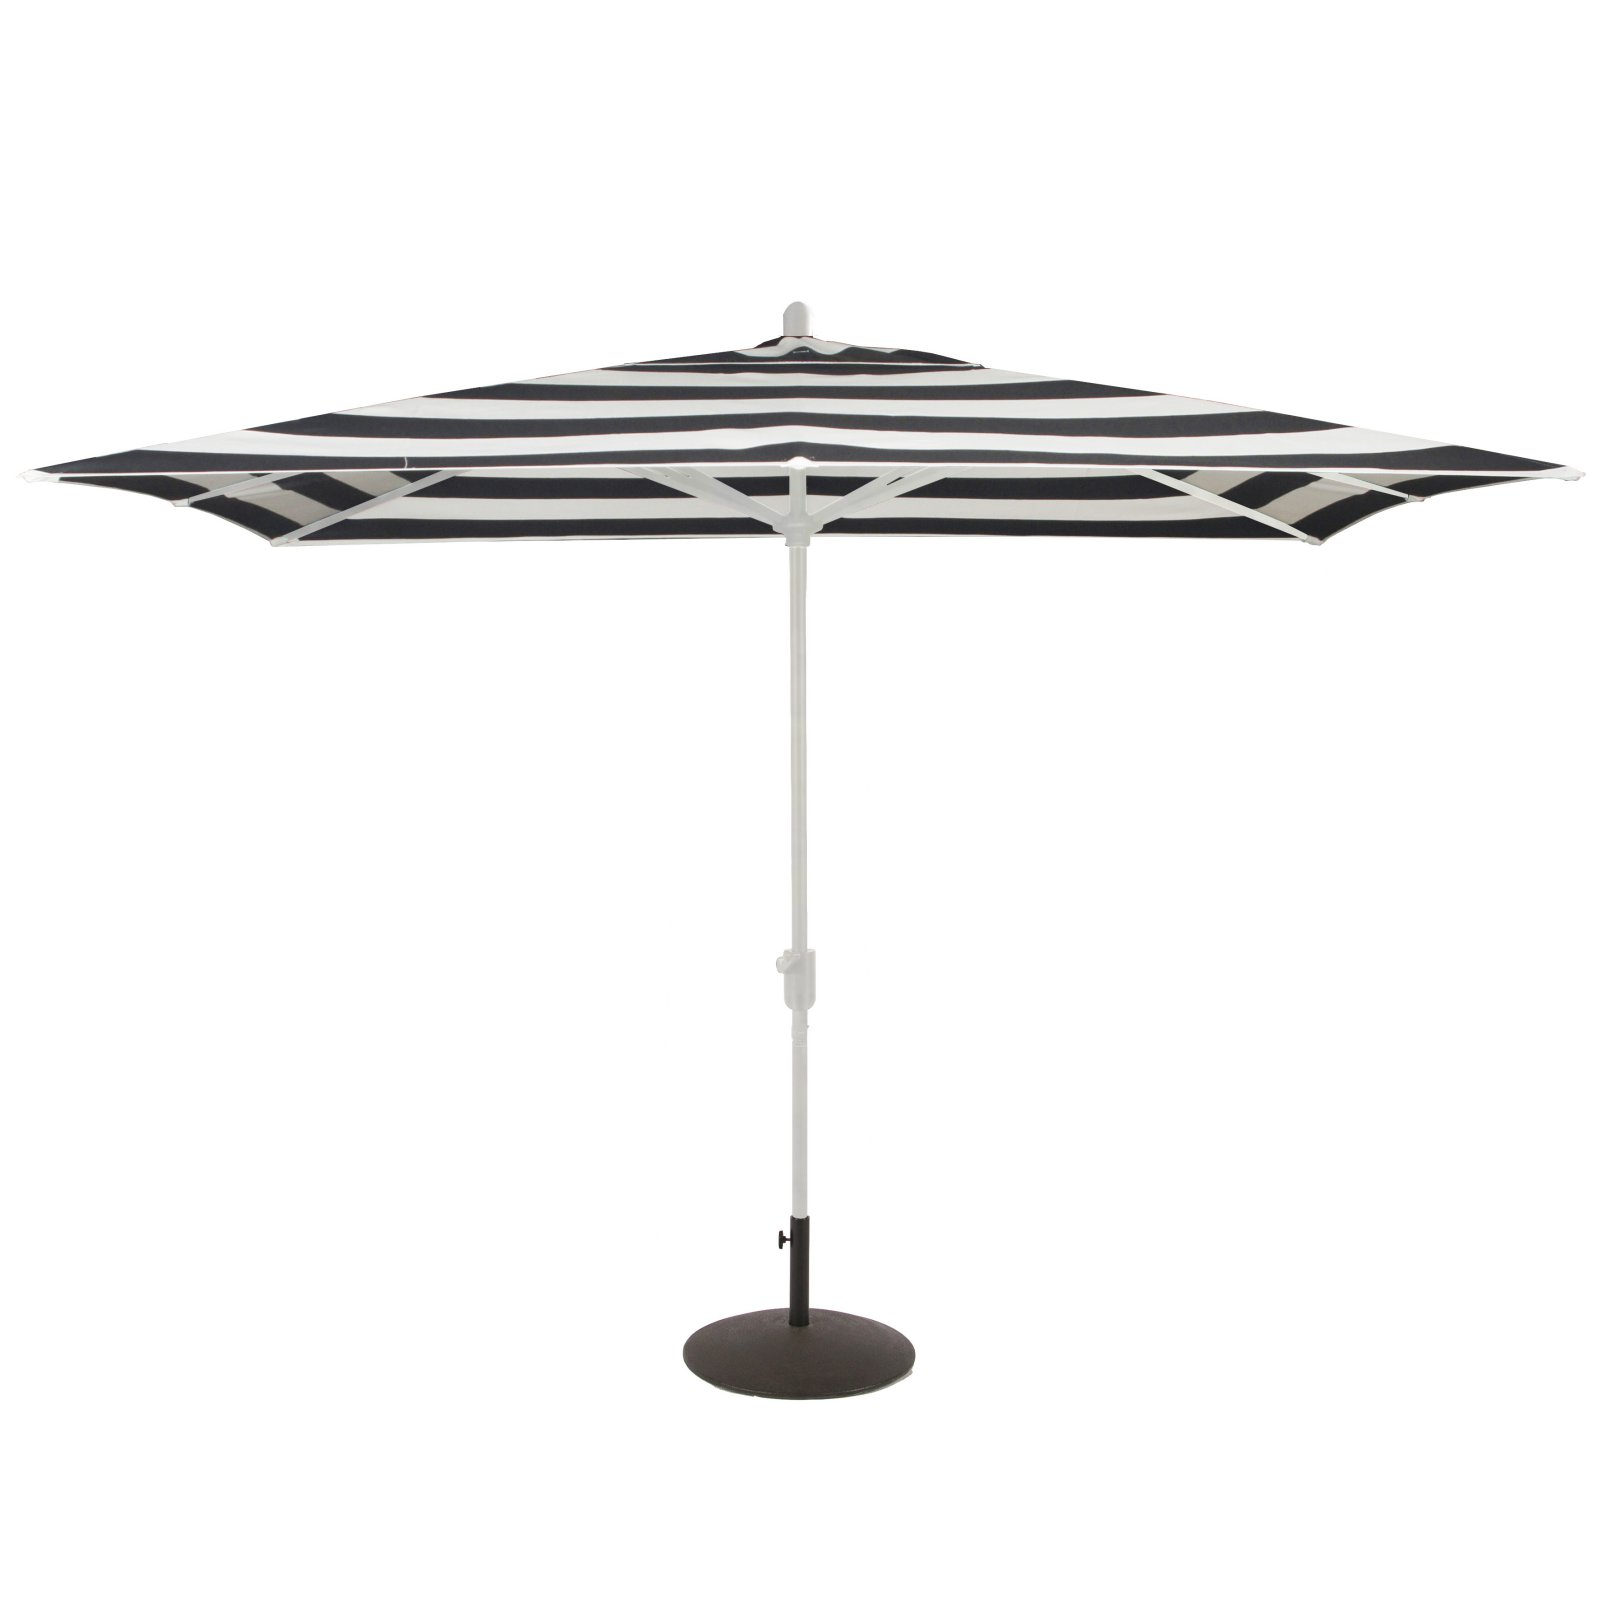 Striped Sunbrella Umbrellas – Caldwellcountytxoem In Well Liked Wiechmann Market Sunbrella Umbrellas (View 13 of 20)